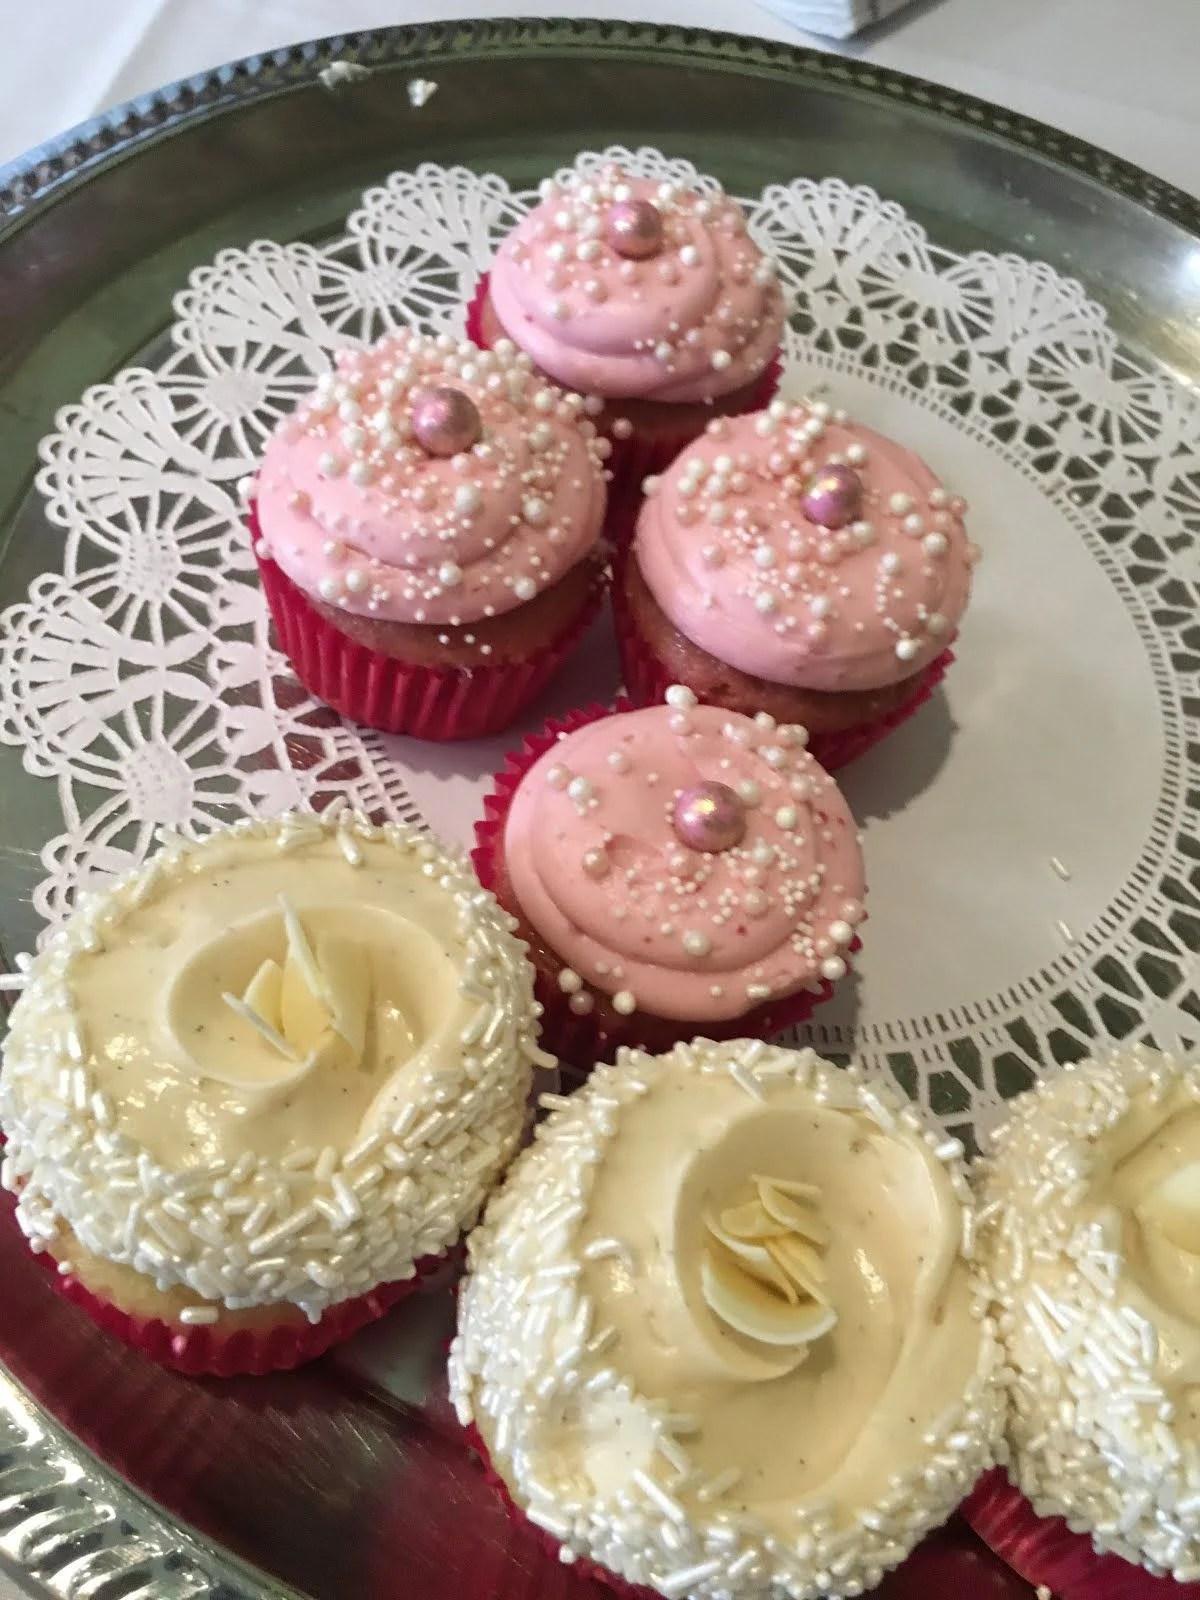 Designer Desserts Opens Cupcake Shop Thursday In Sville Eat